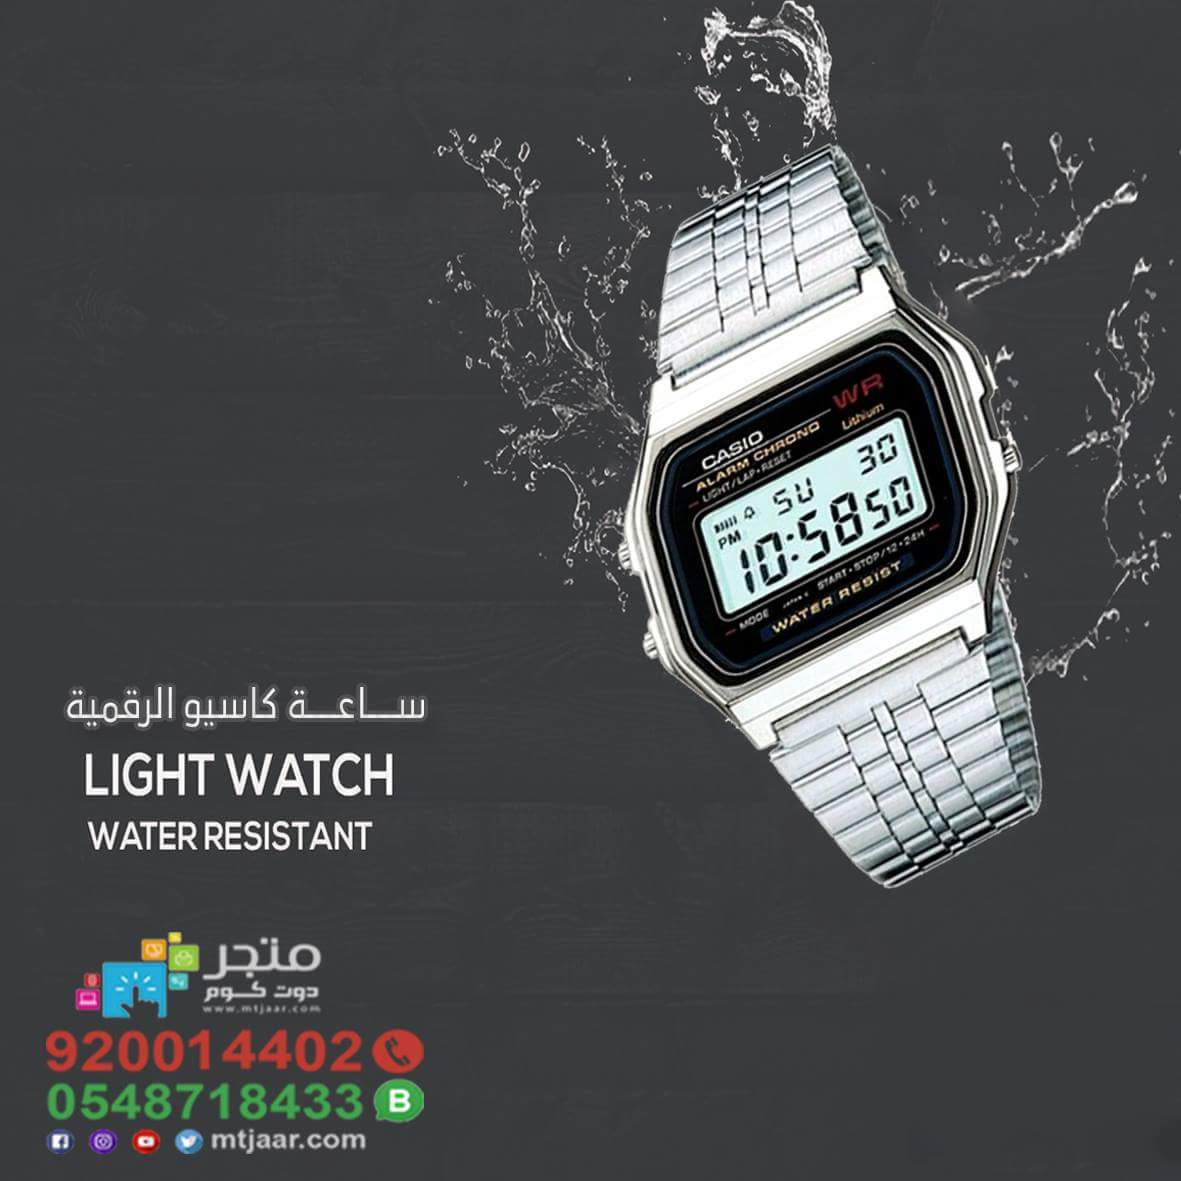 b96c86e95 #كاسيو #ساعات #ساعة #ستايل #رجالي #Watch #CASIO #men #الوقت #دقيقة #توقيت  #Time #timing #Accurate #الوان #مقاومة_ماء #Water_resistance #Colors  #بيغ_بن ...